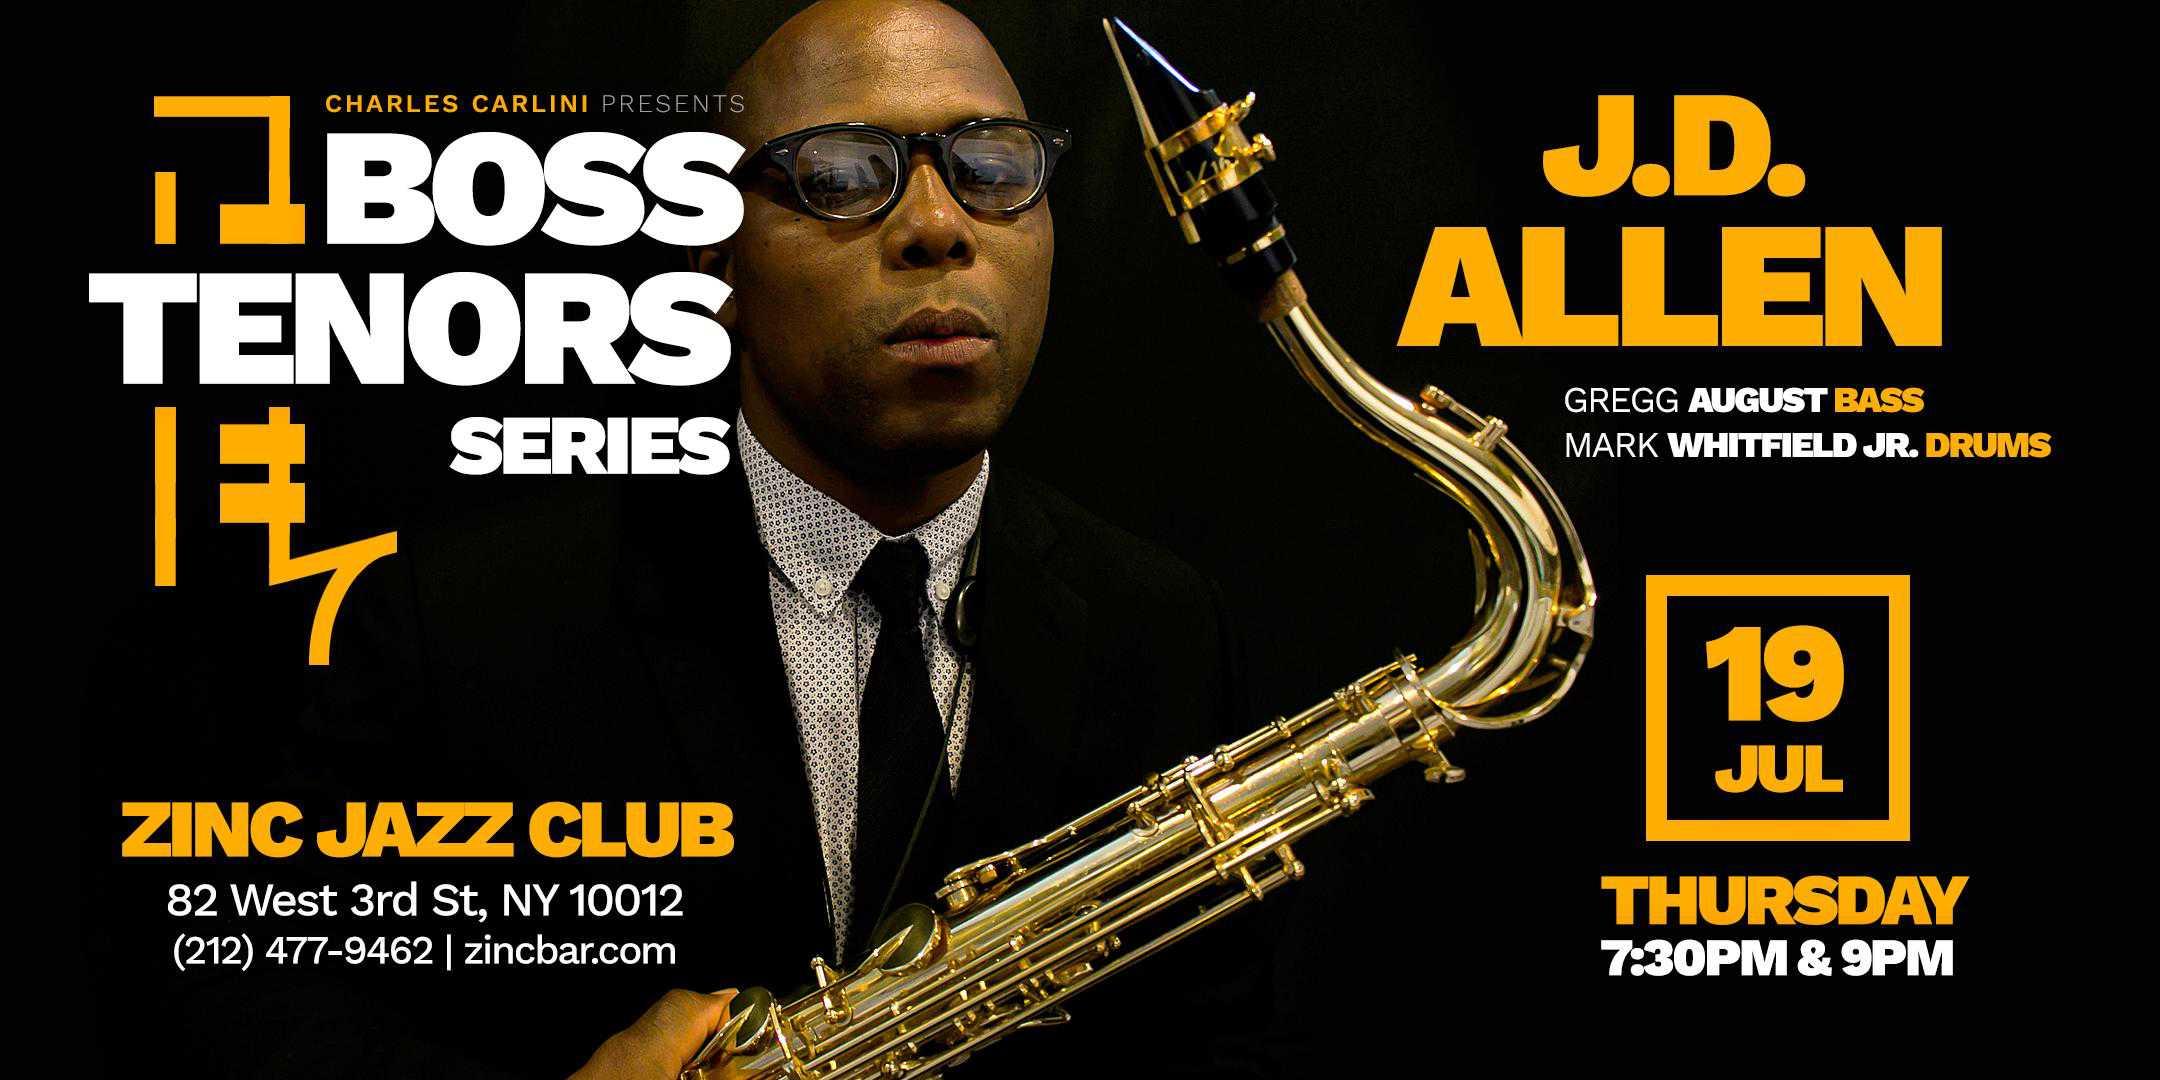 Boss Tenors Series: J.D. Allen Trio